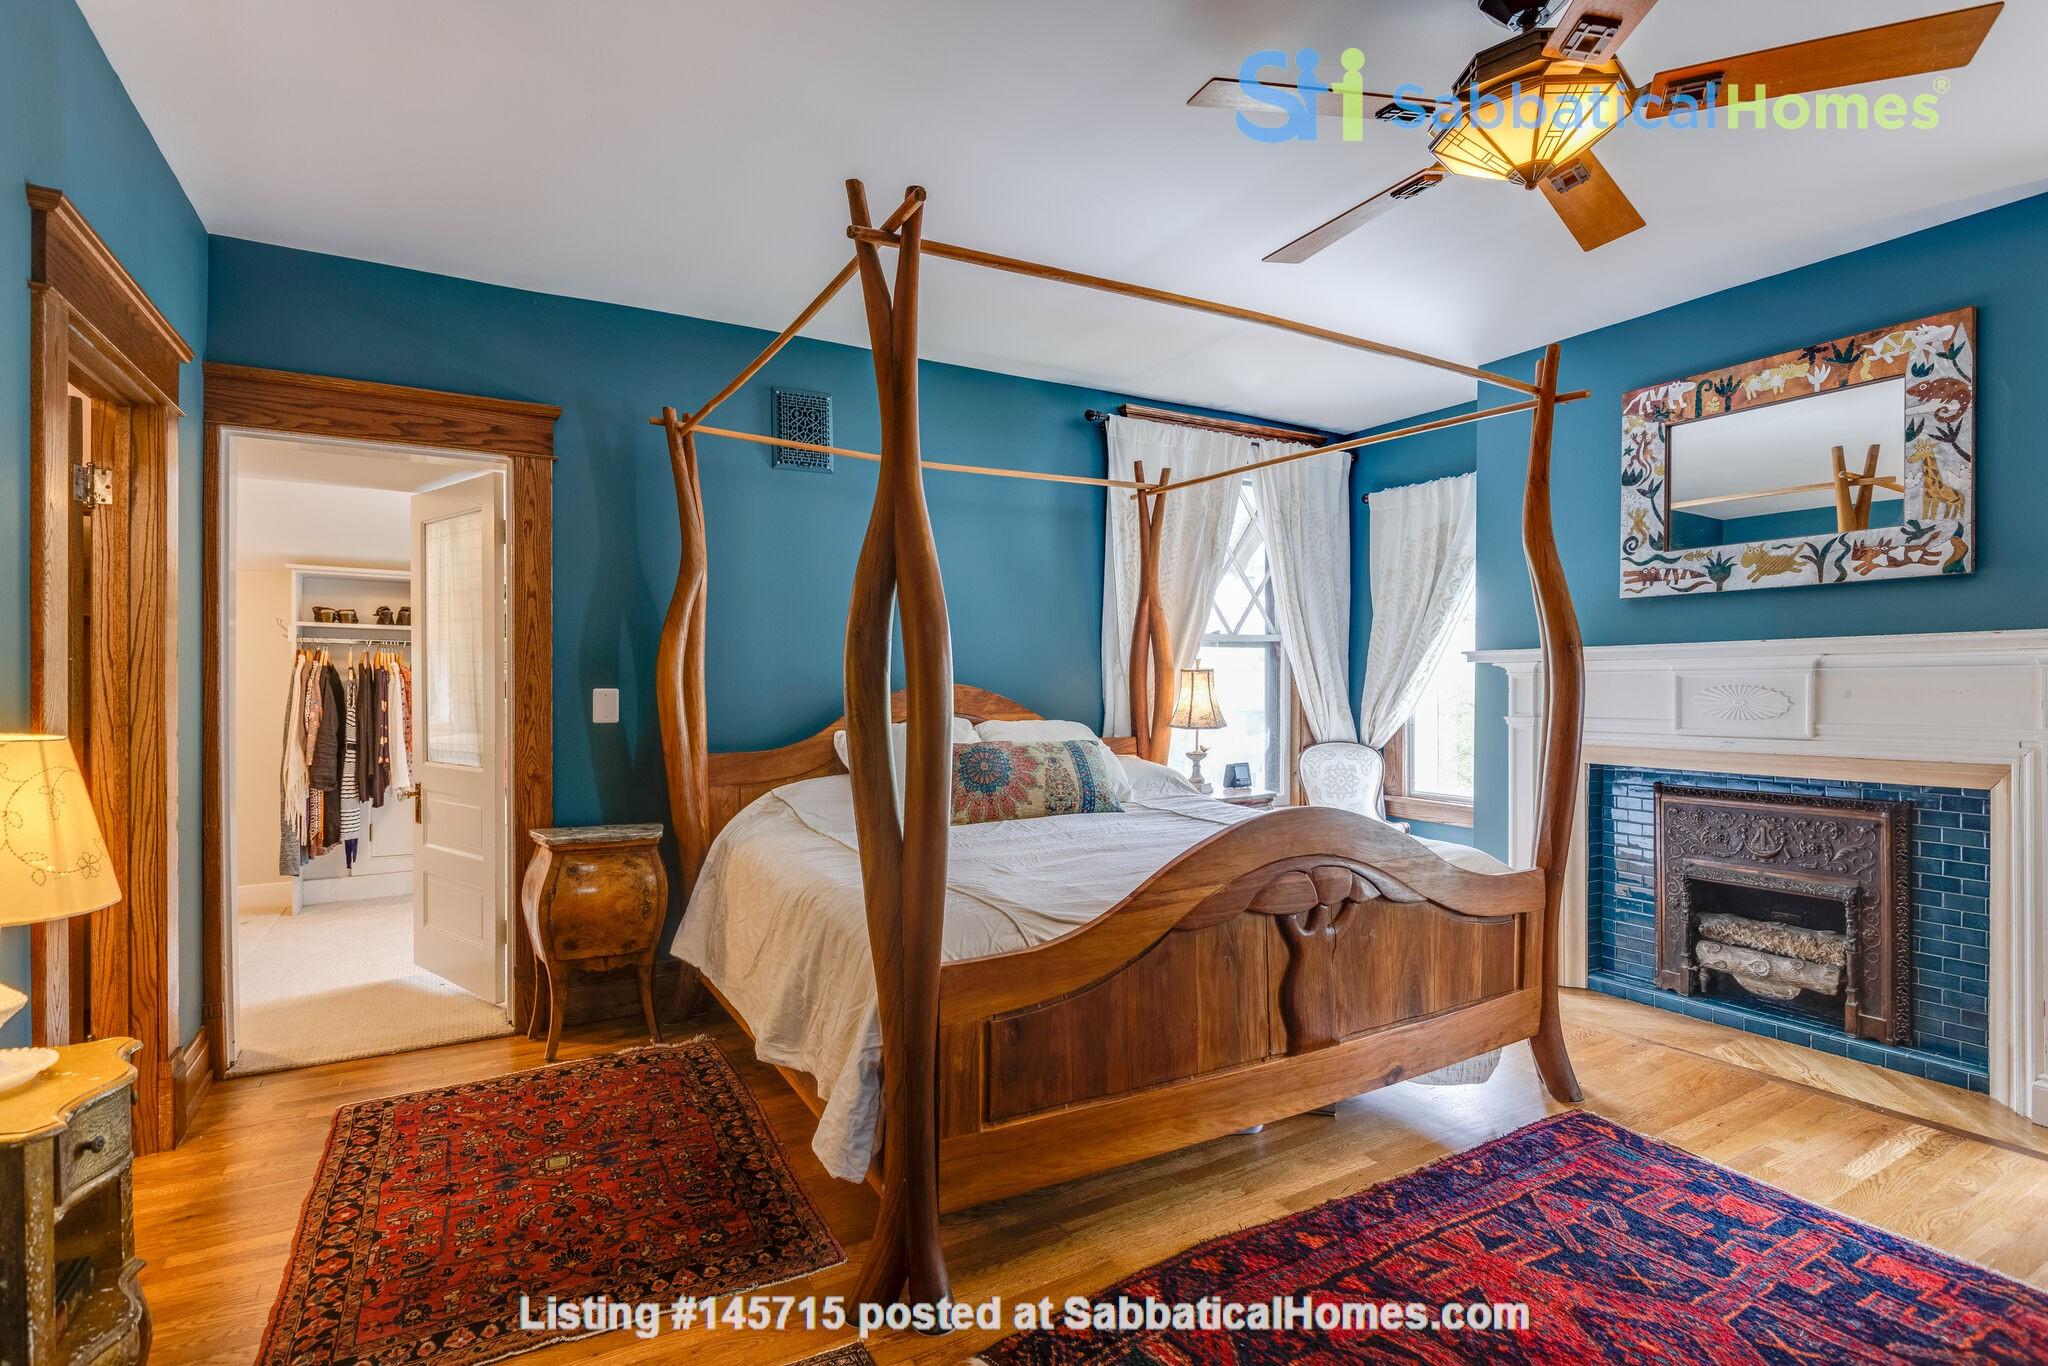 5 BR/3 + 2 BA Historic gem in Belmont-Hillsboro Home Rental in Nashville 7